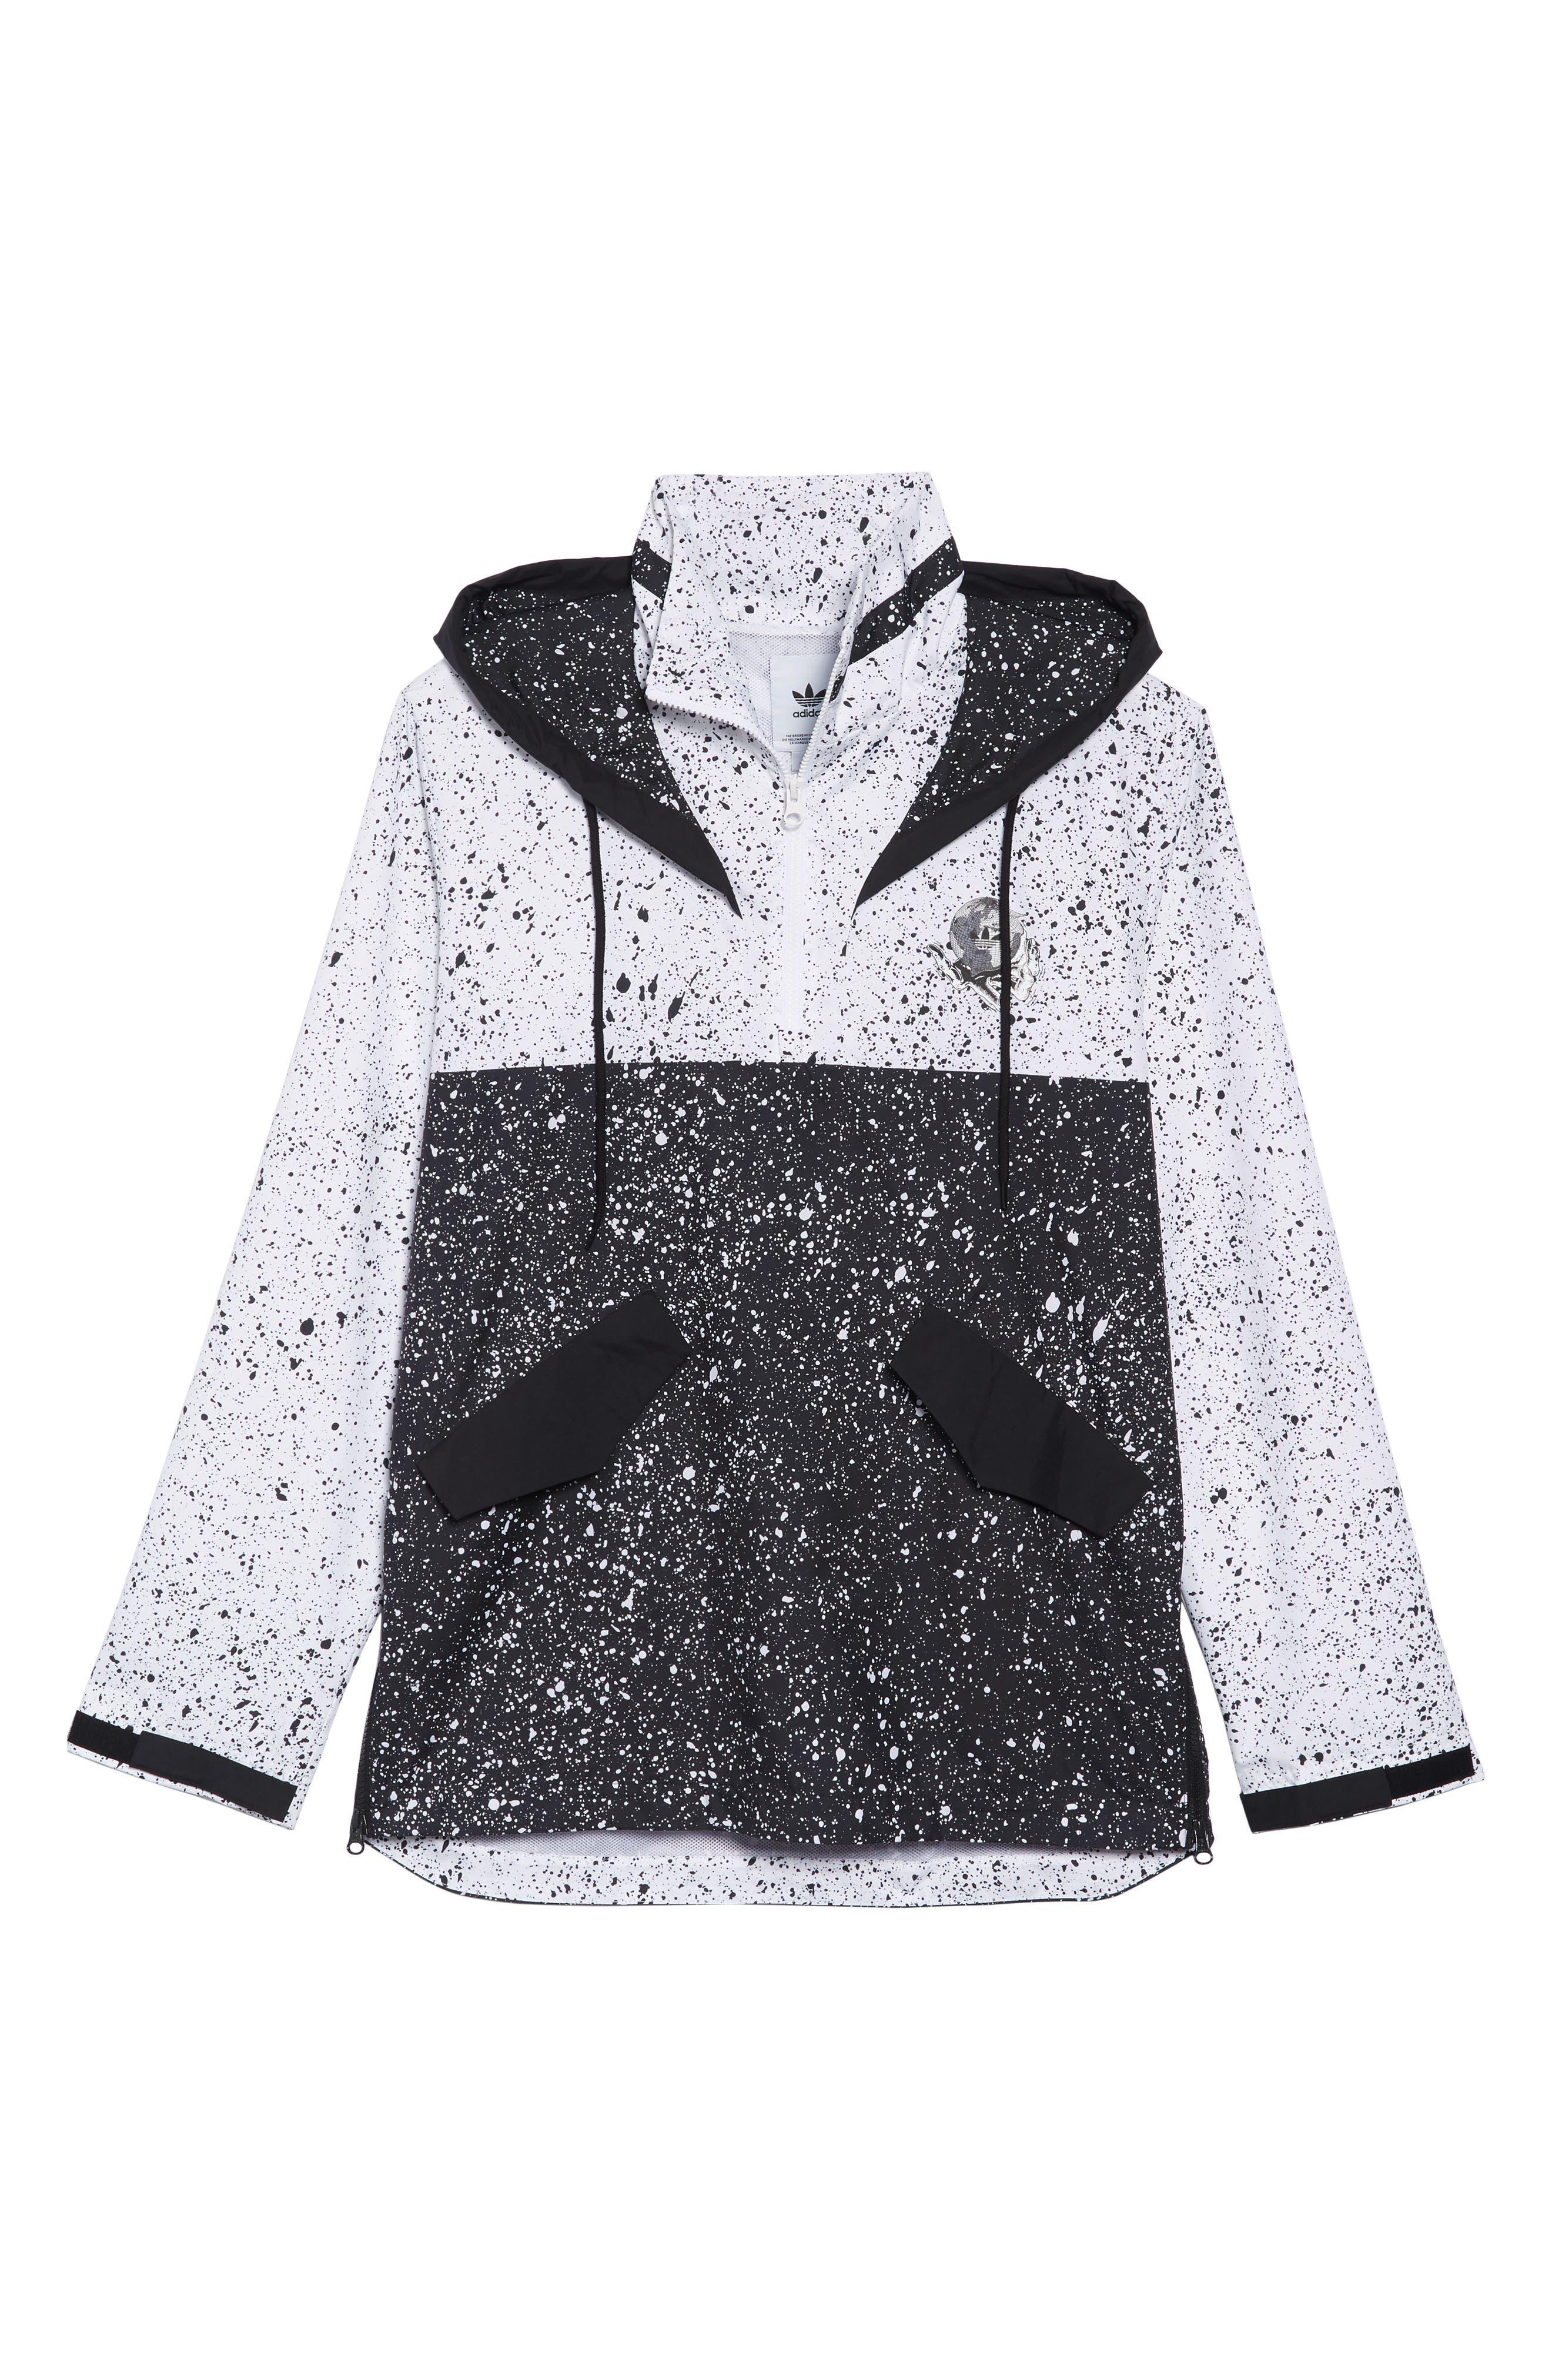 adidas Planetoid Windbreaker,                             Alternate thumbnail 6, color,                             BLACK/ WHITE